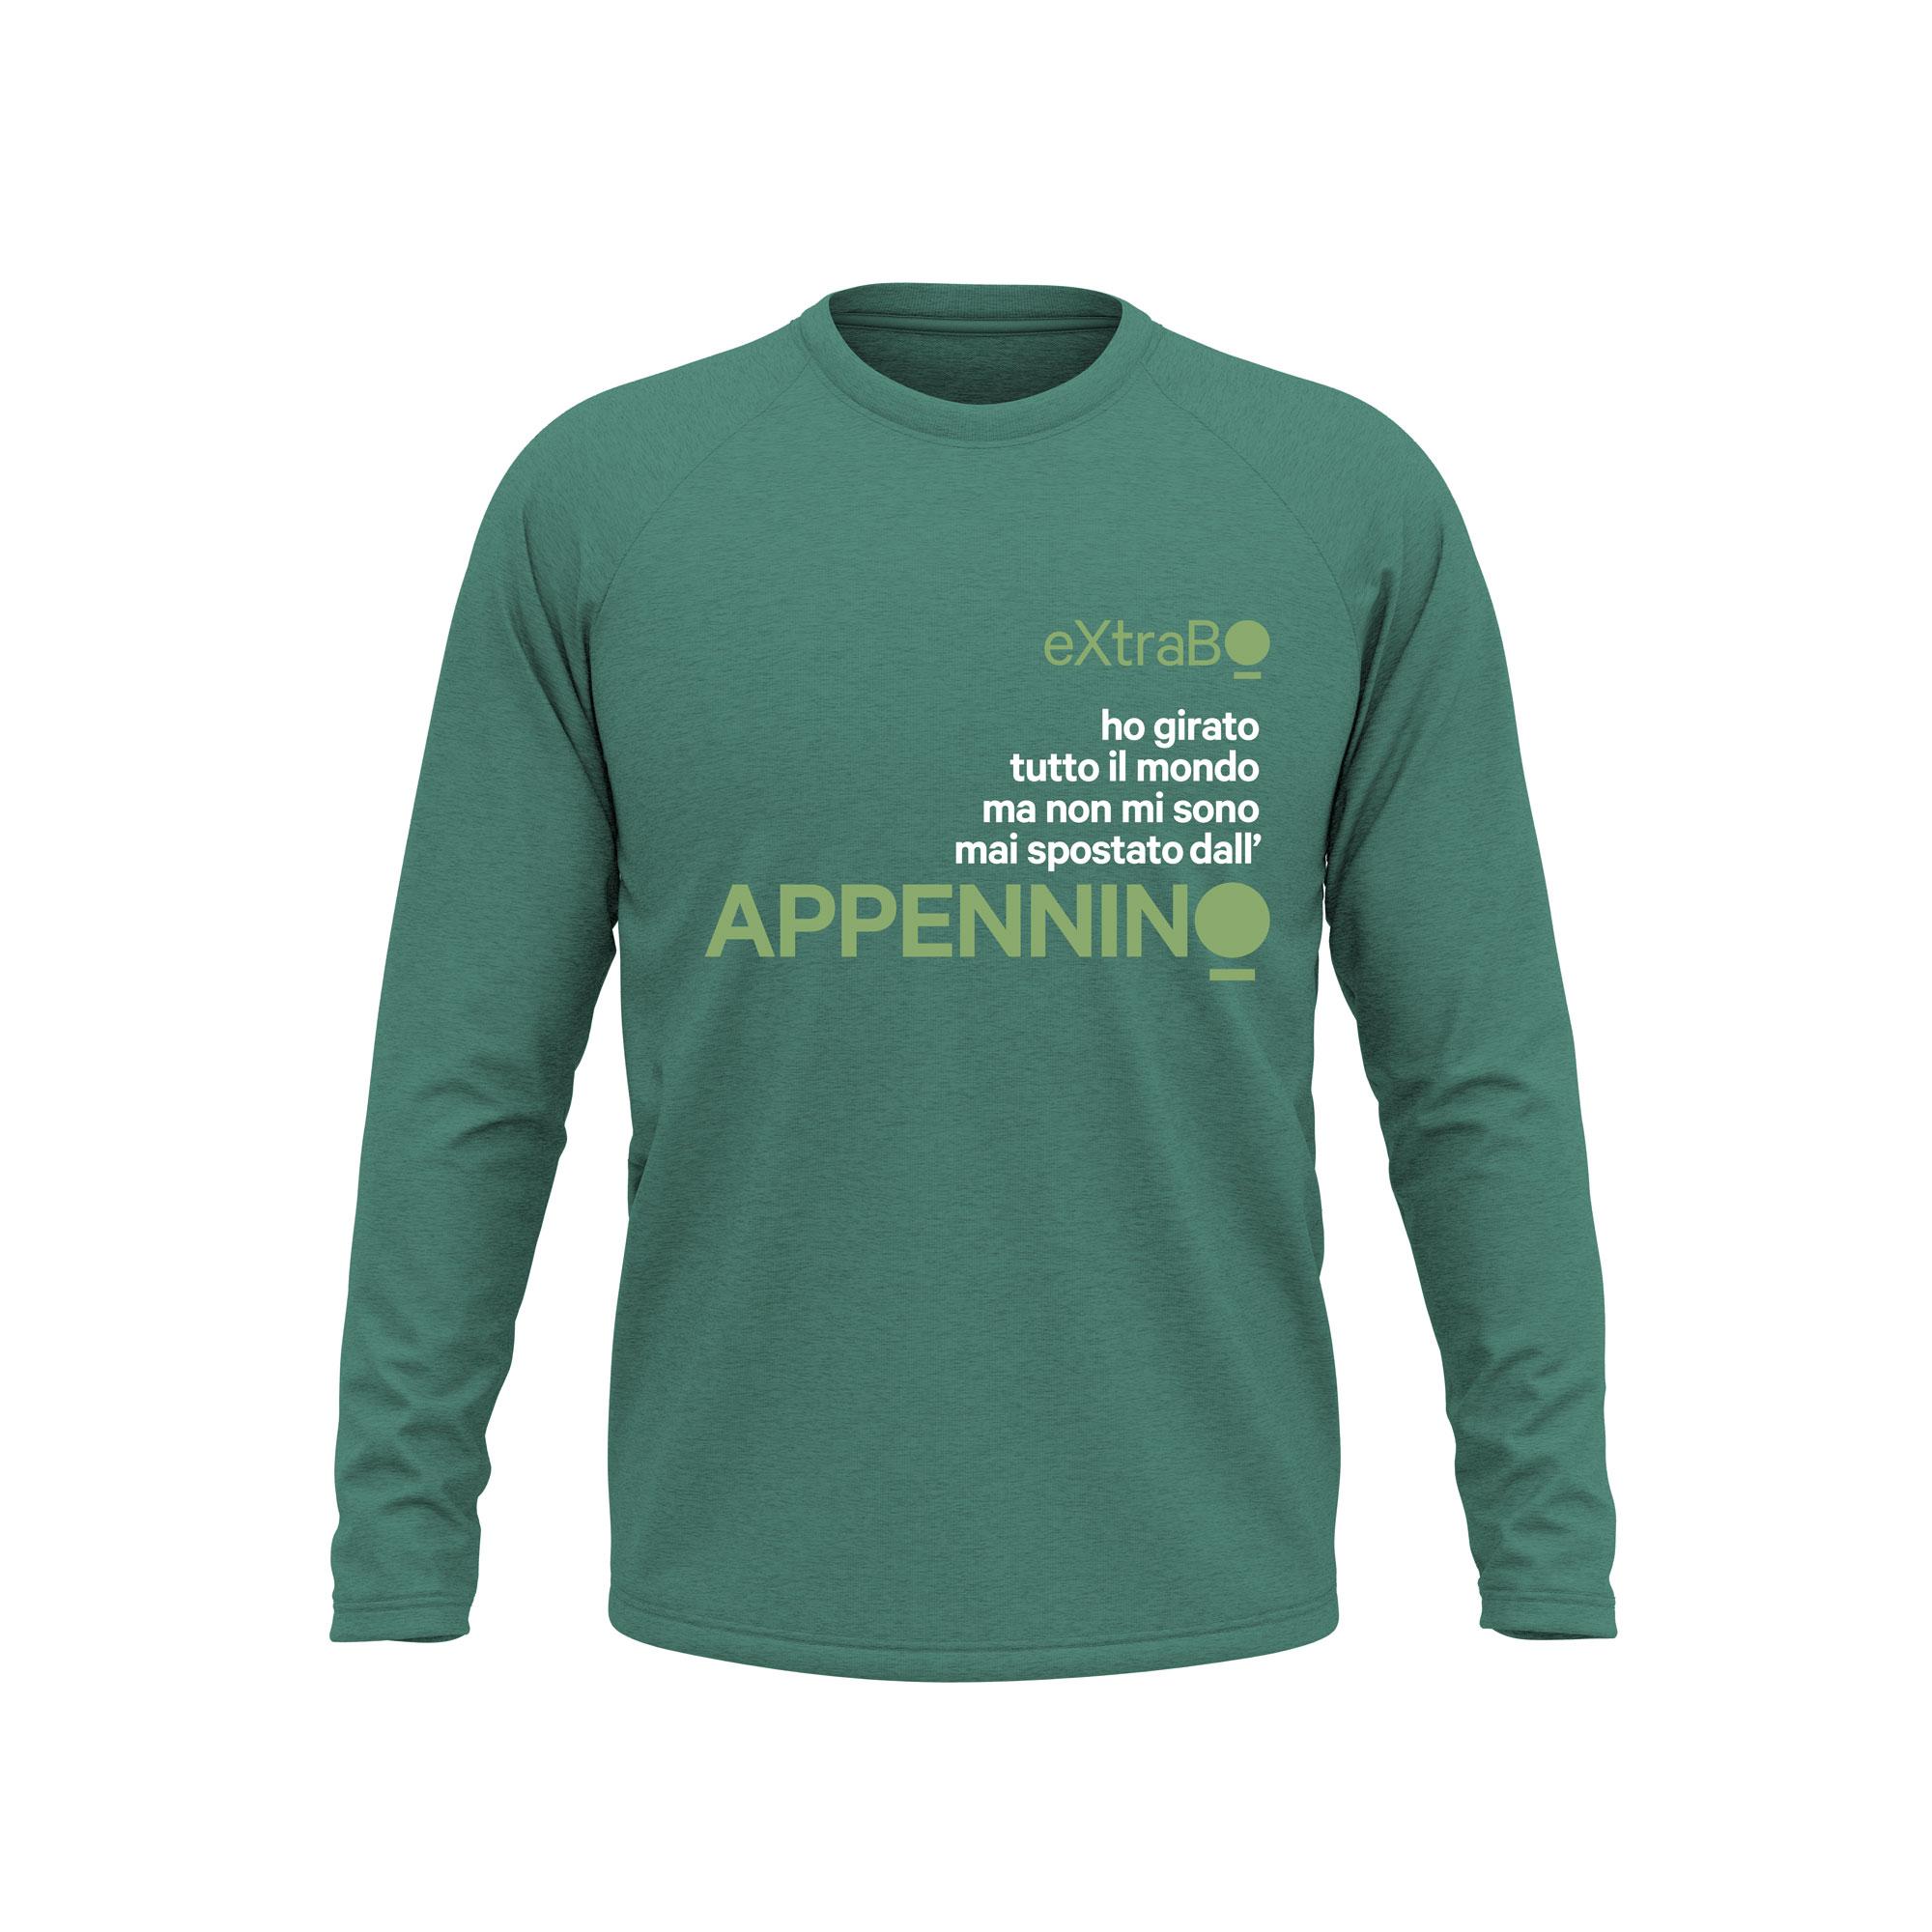 Mockup_appennino